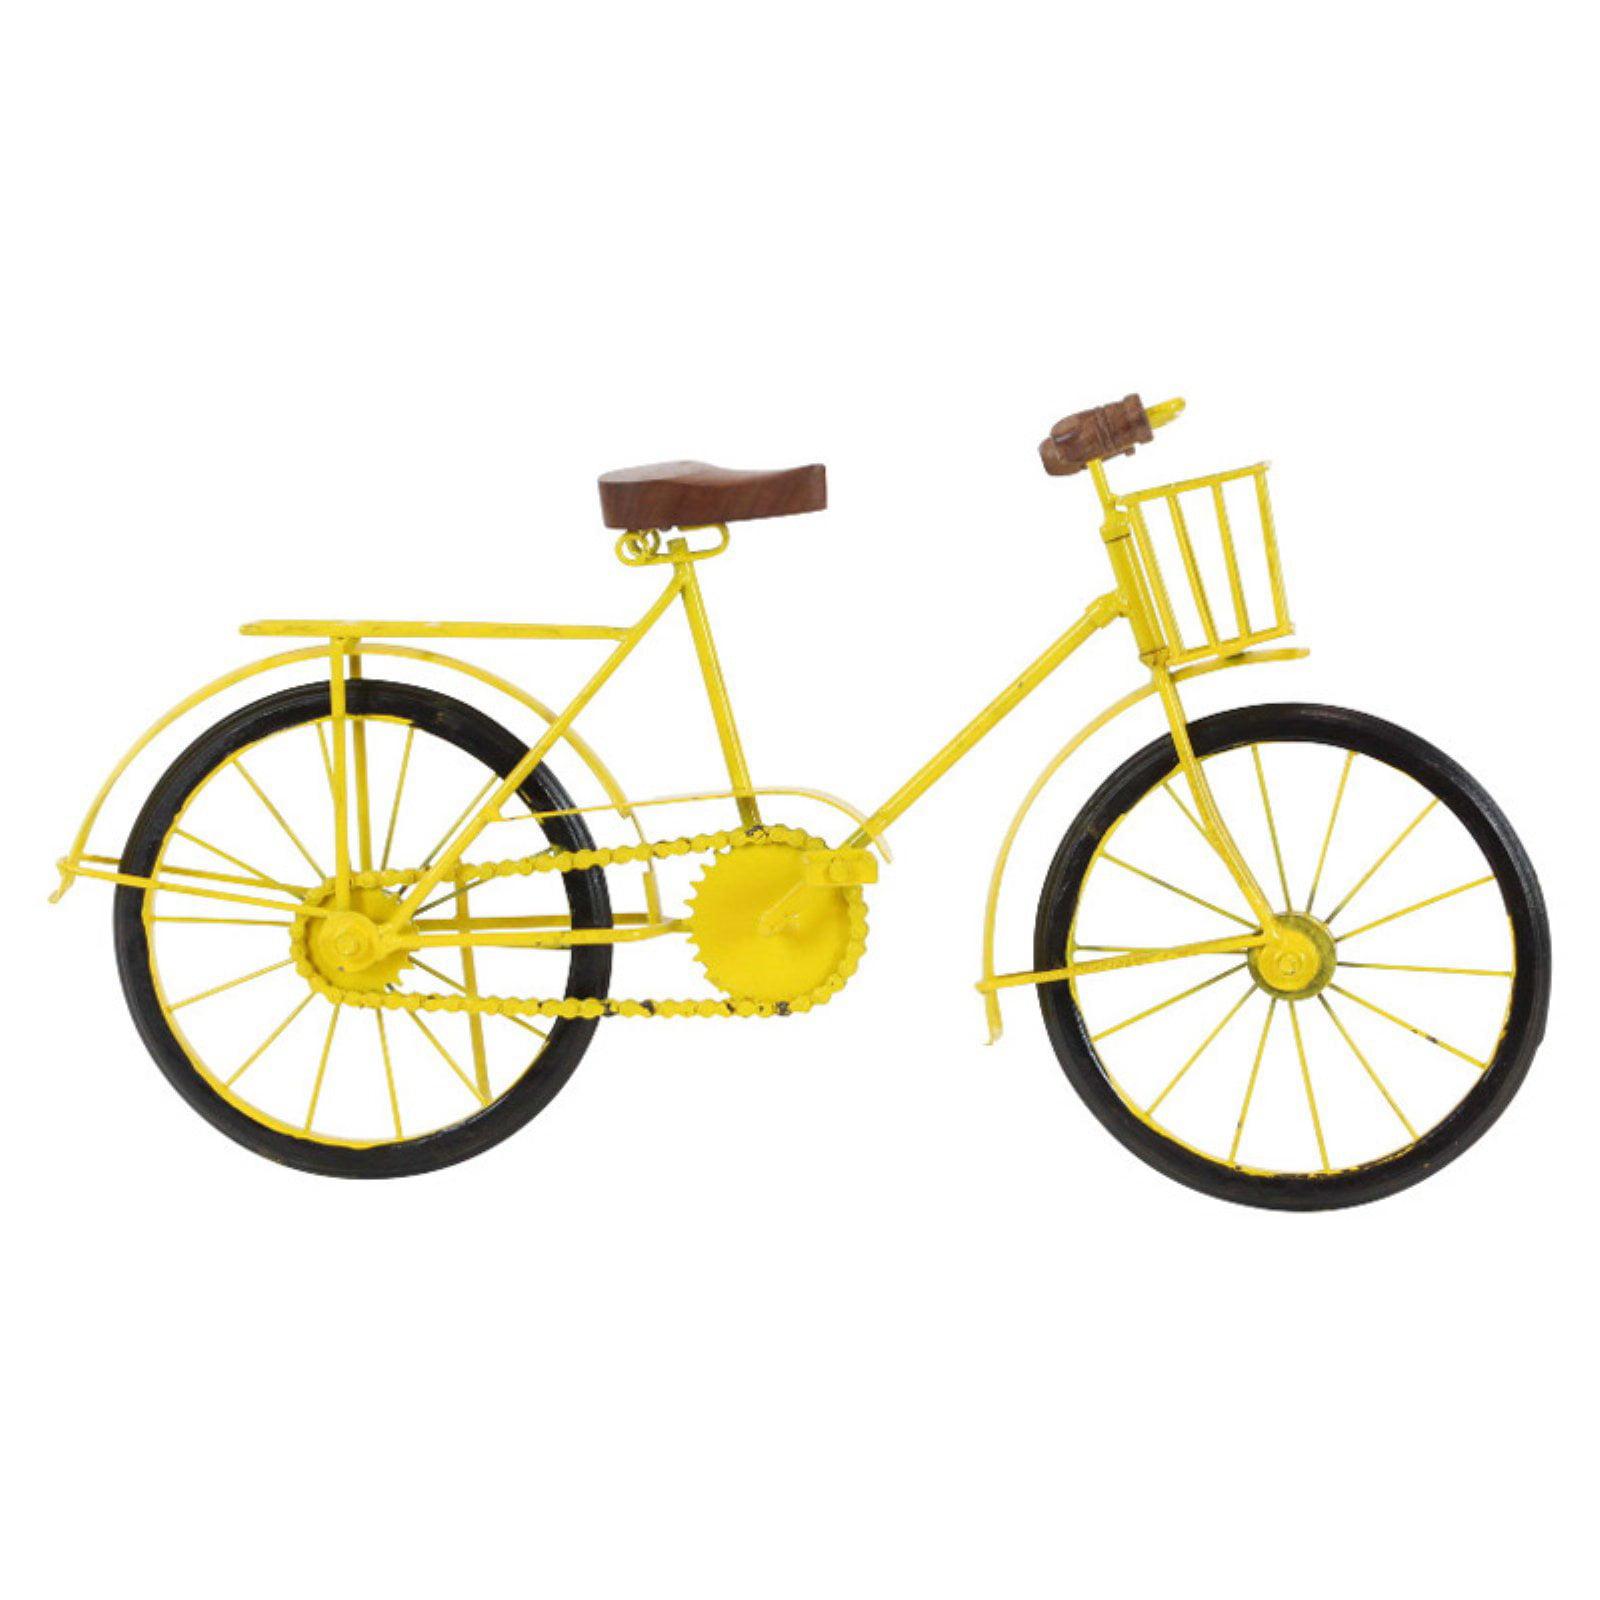 Epoch Blue Bicycle Decor - Walmart.com